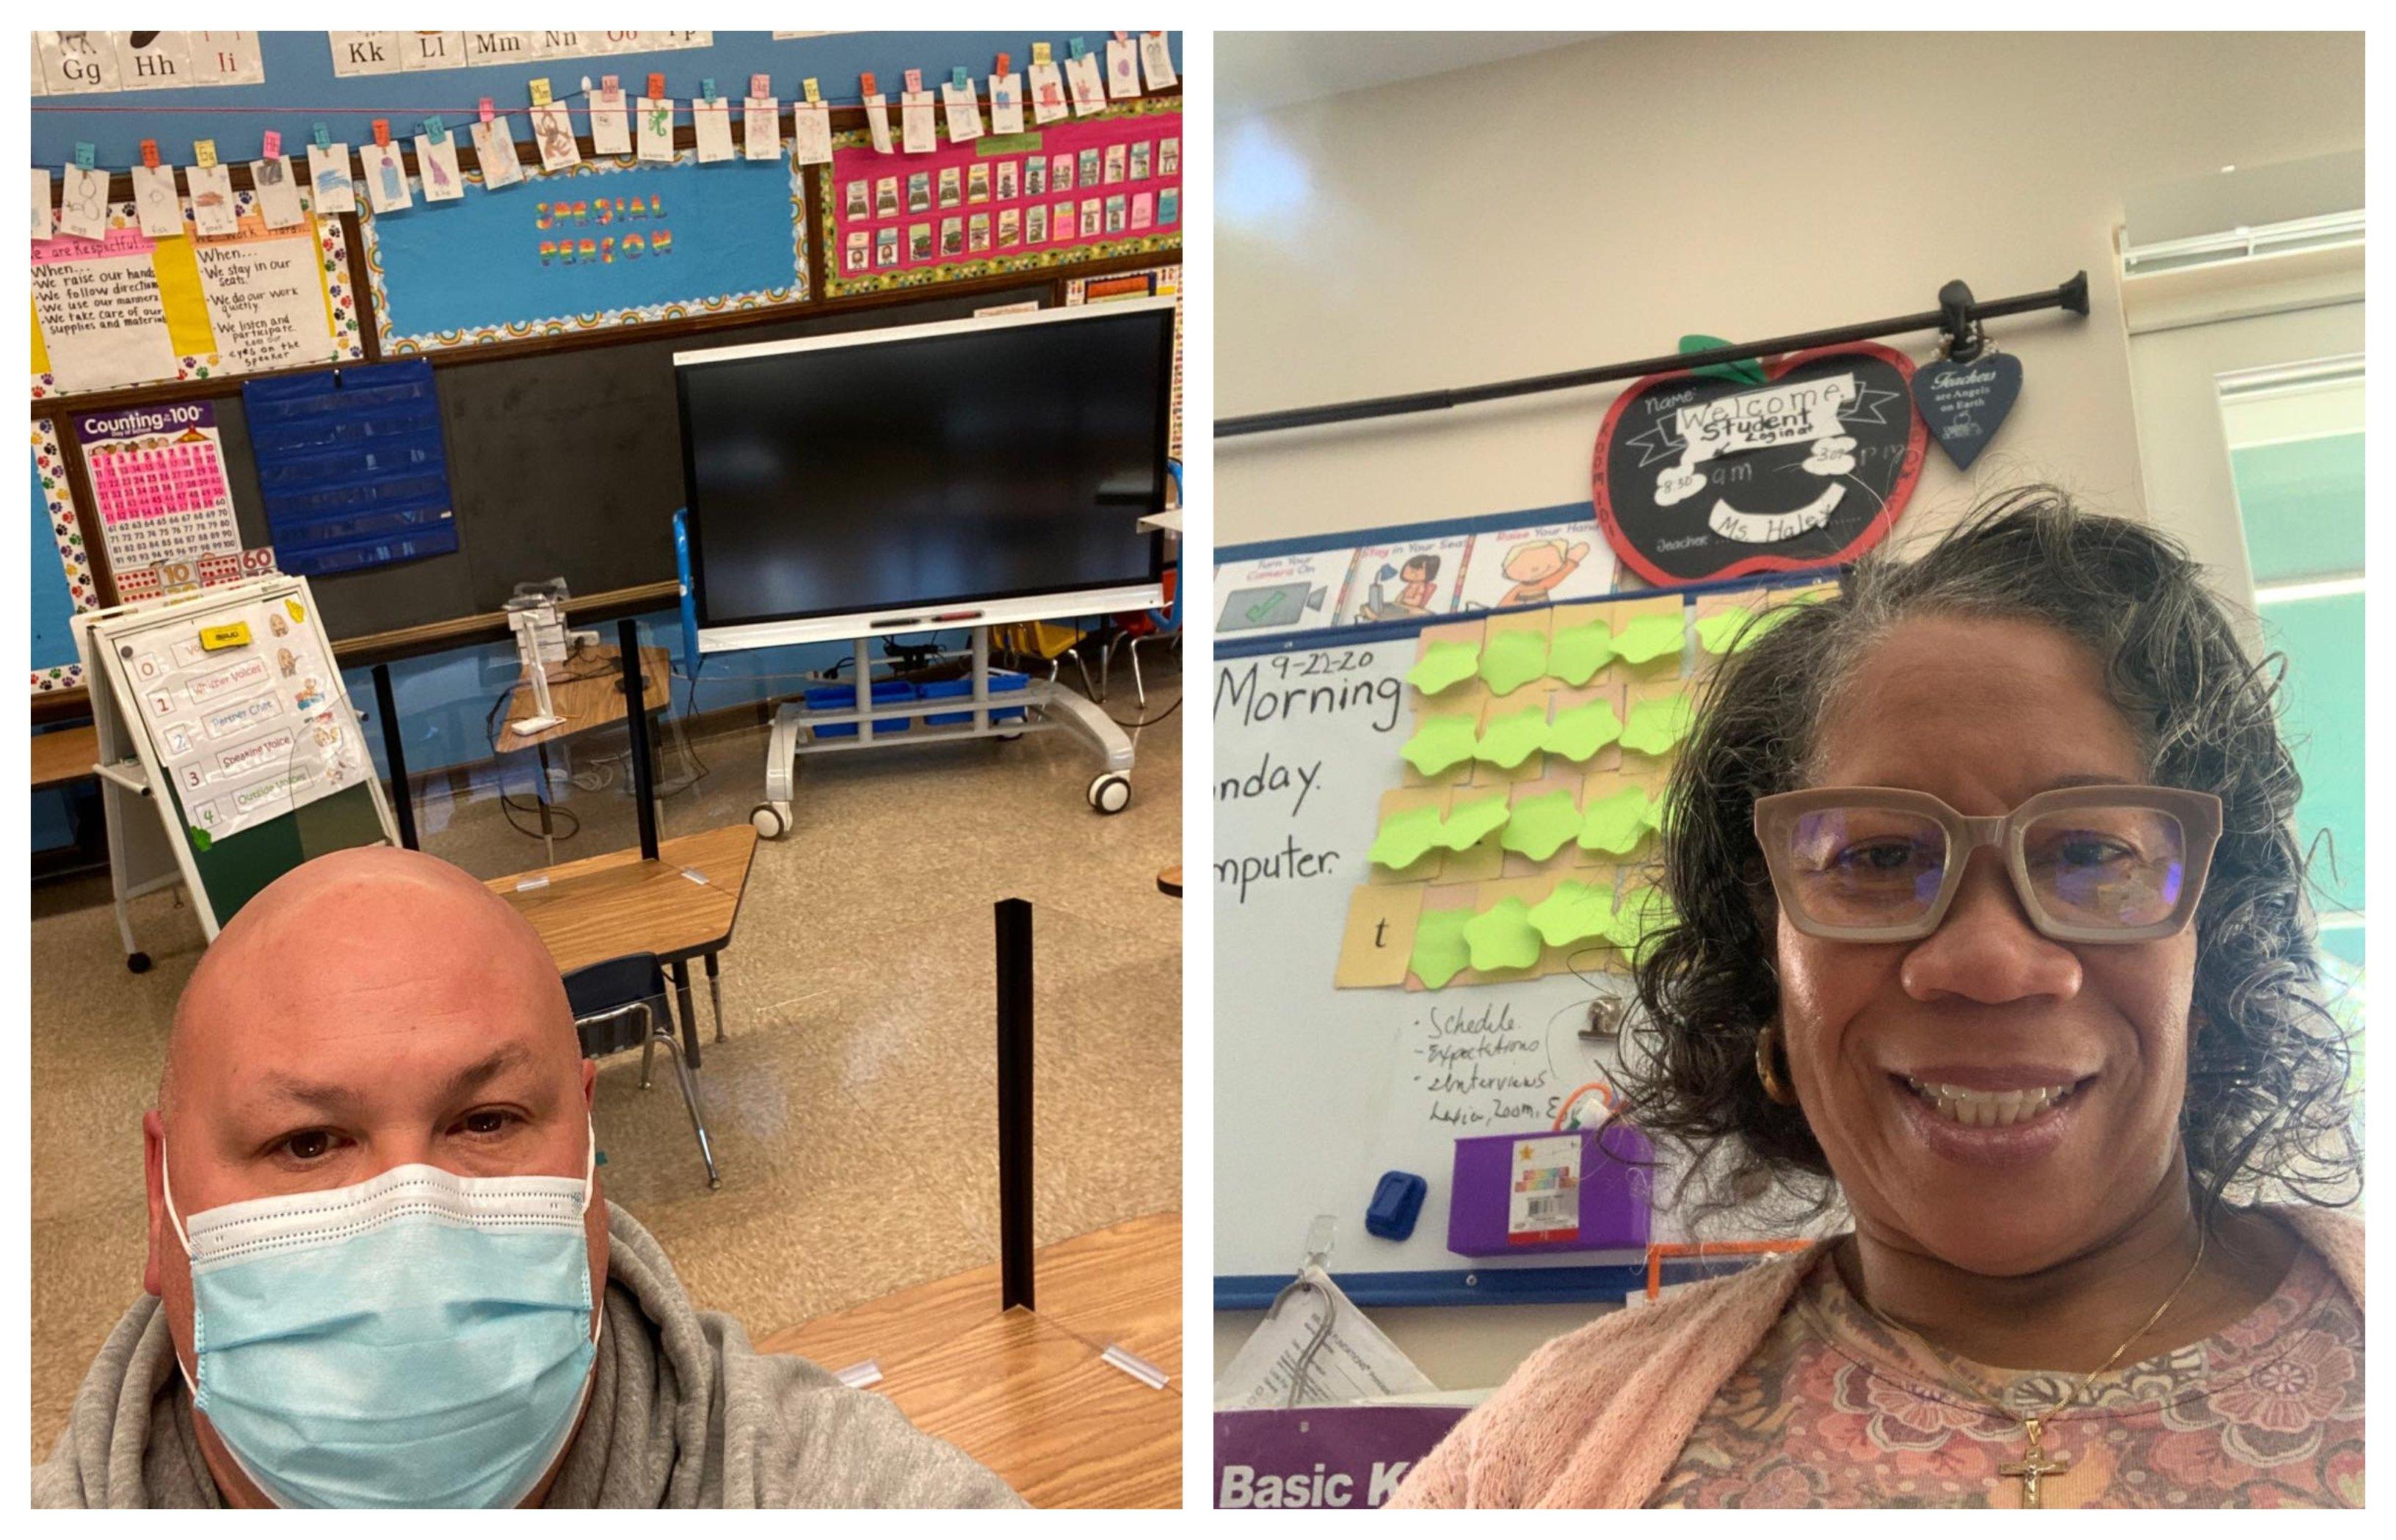 Dan DiMartino (left) is a kindergarten teacher at Shawmont Elementary in Roxborough. Valerie Haley (right) is a kindergarten teacher at William Rowen Elementary School in West Oak Lane.